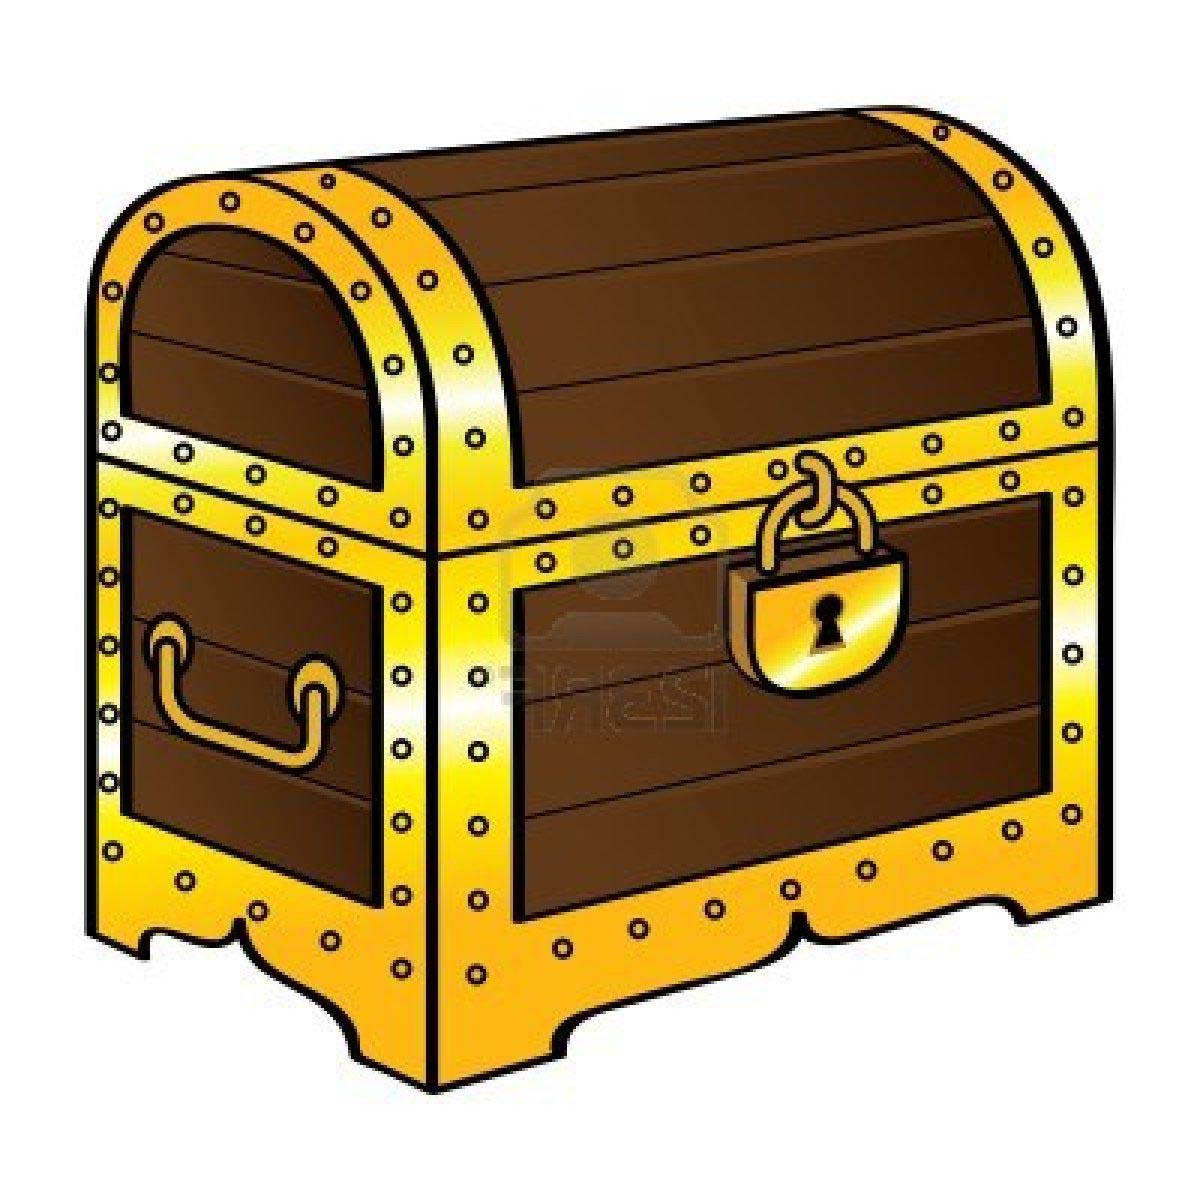 Chest clip art free. Treasure clipart locked box